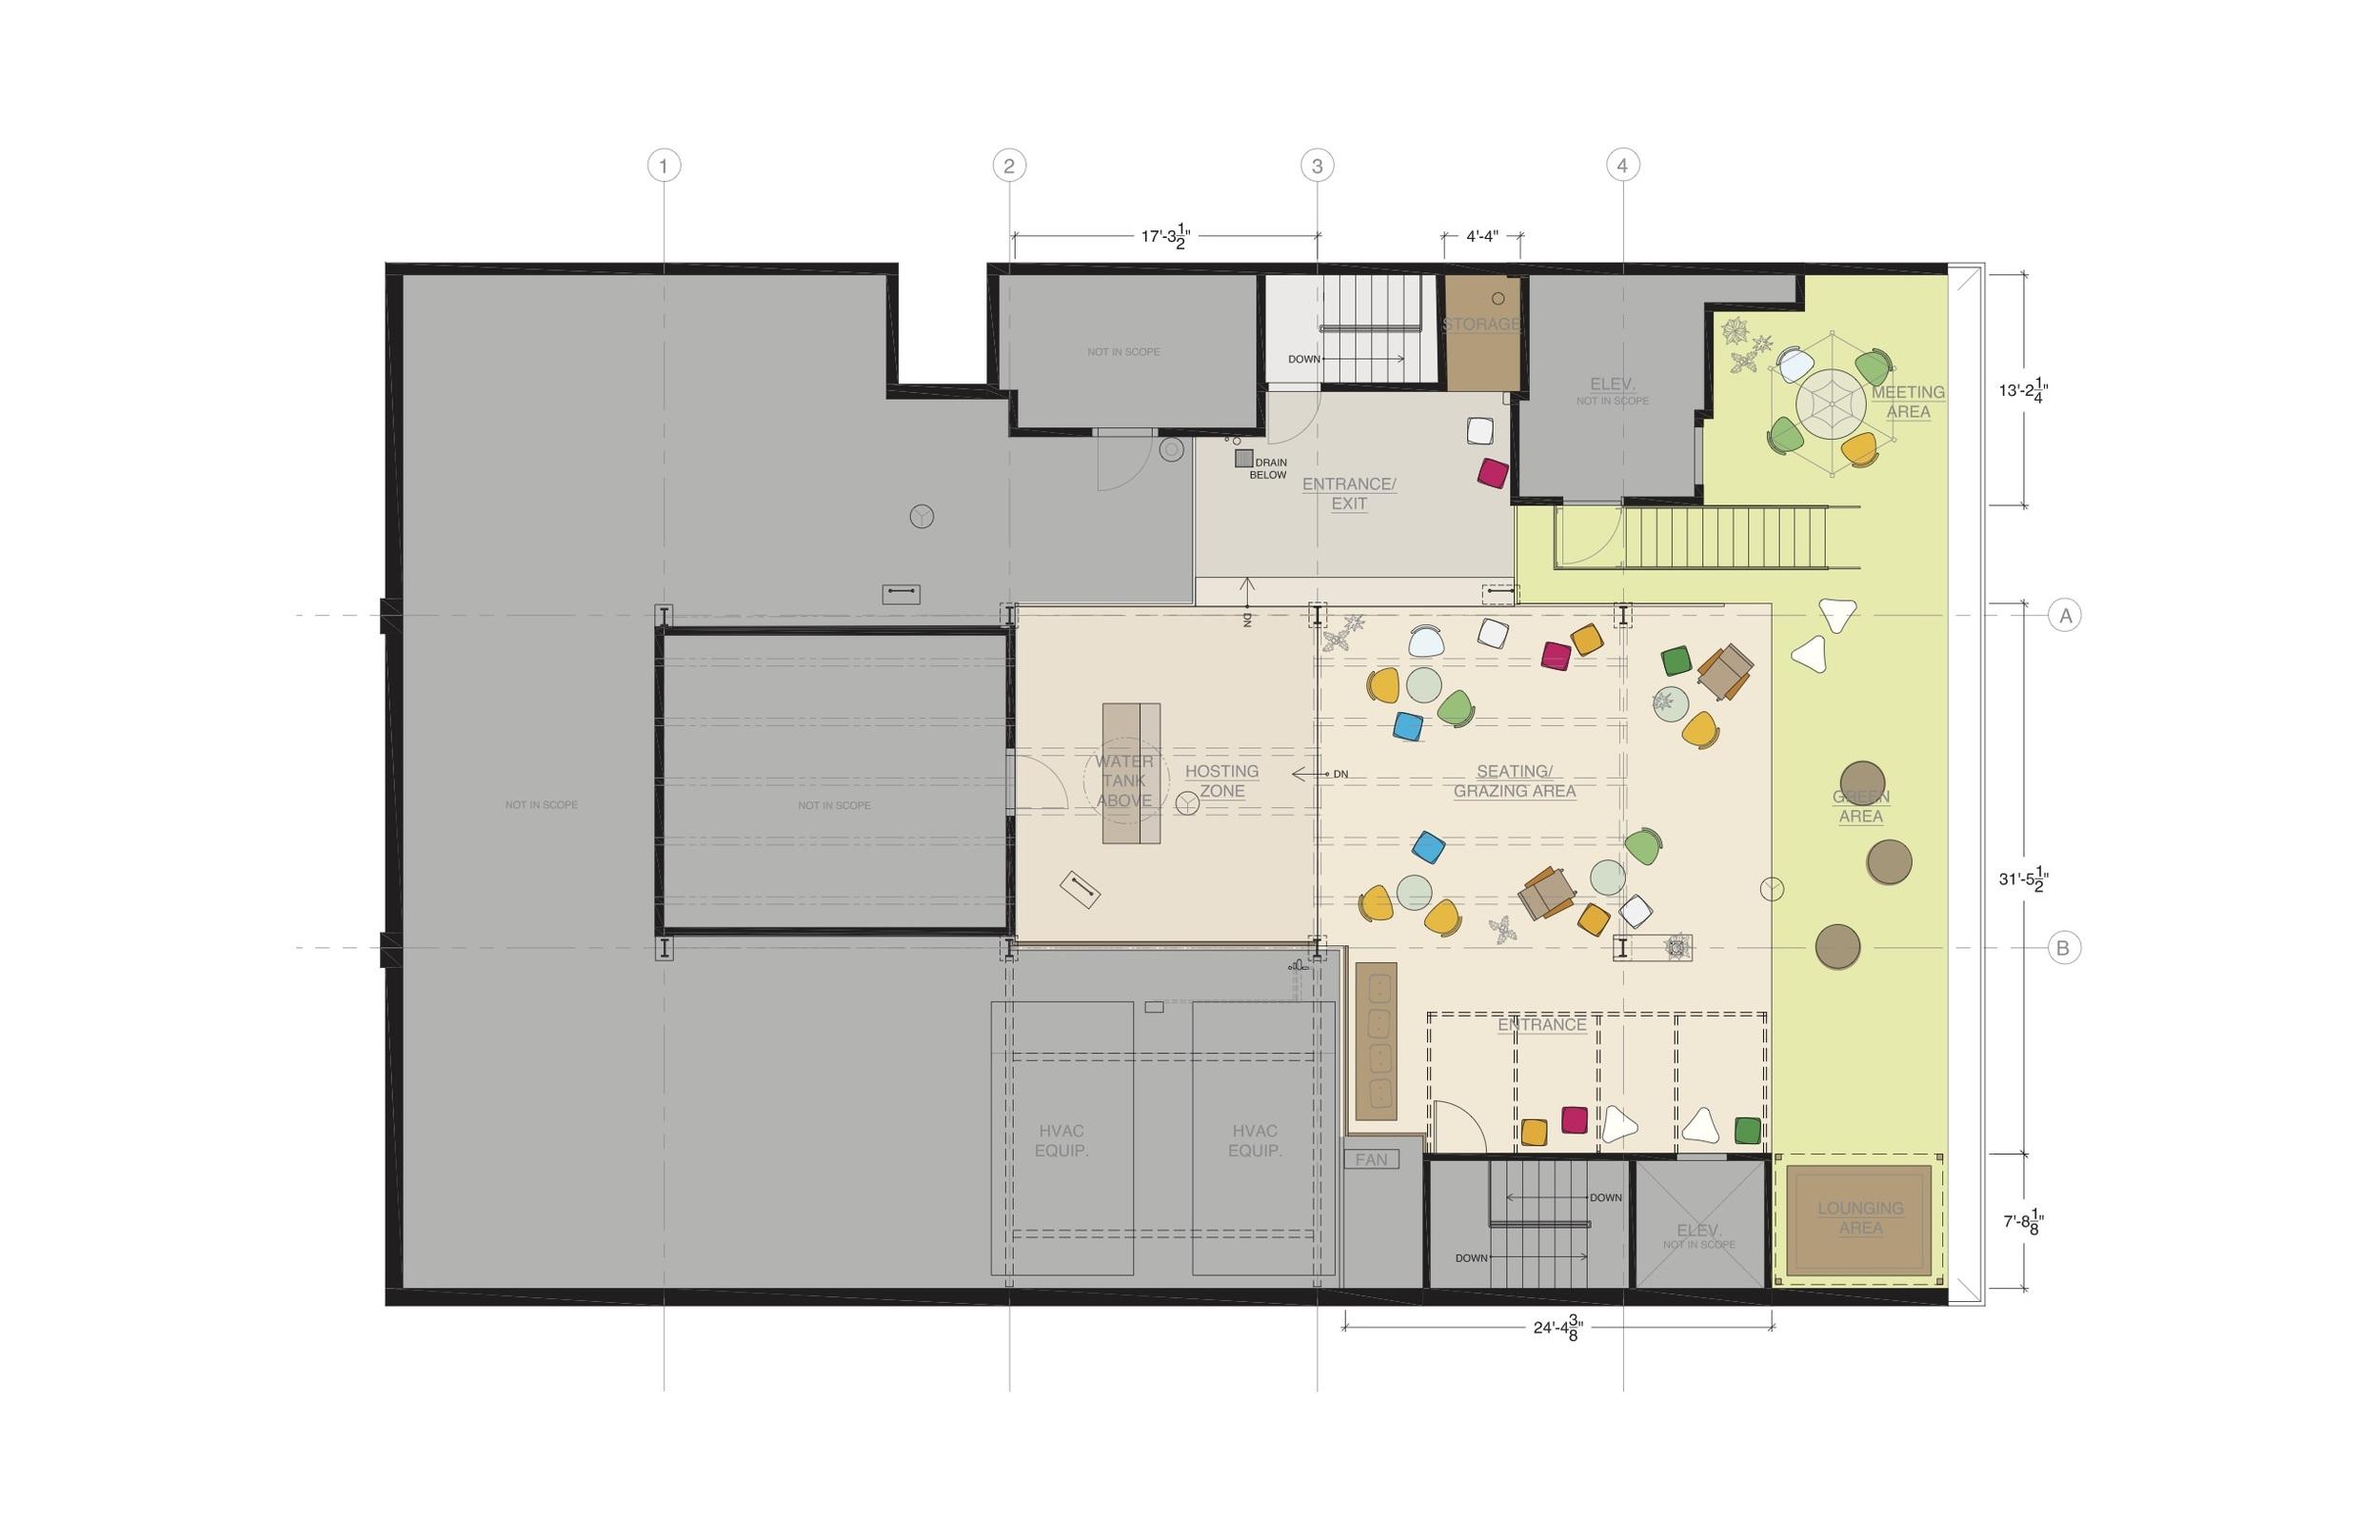 130726_Wix_Rooftop_Option-1_Floorplan.jpg